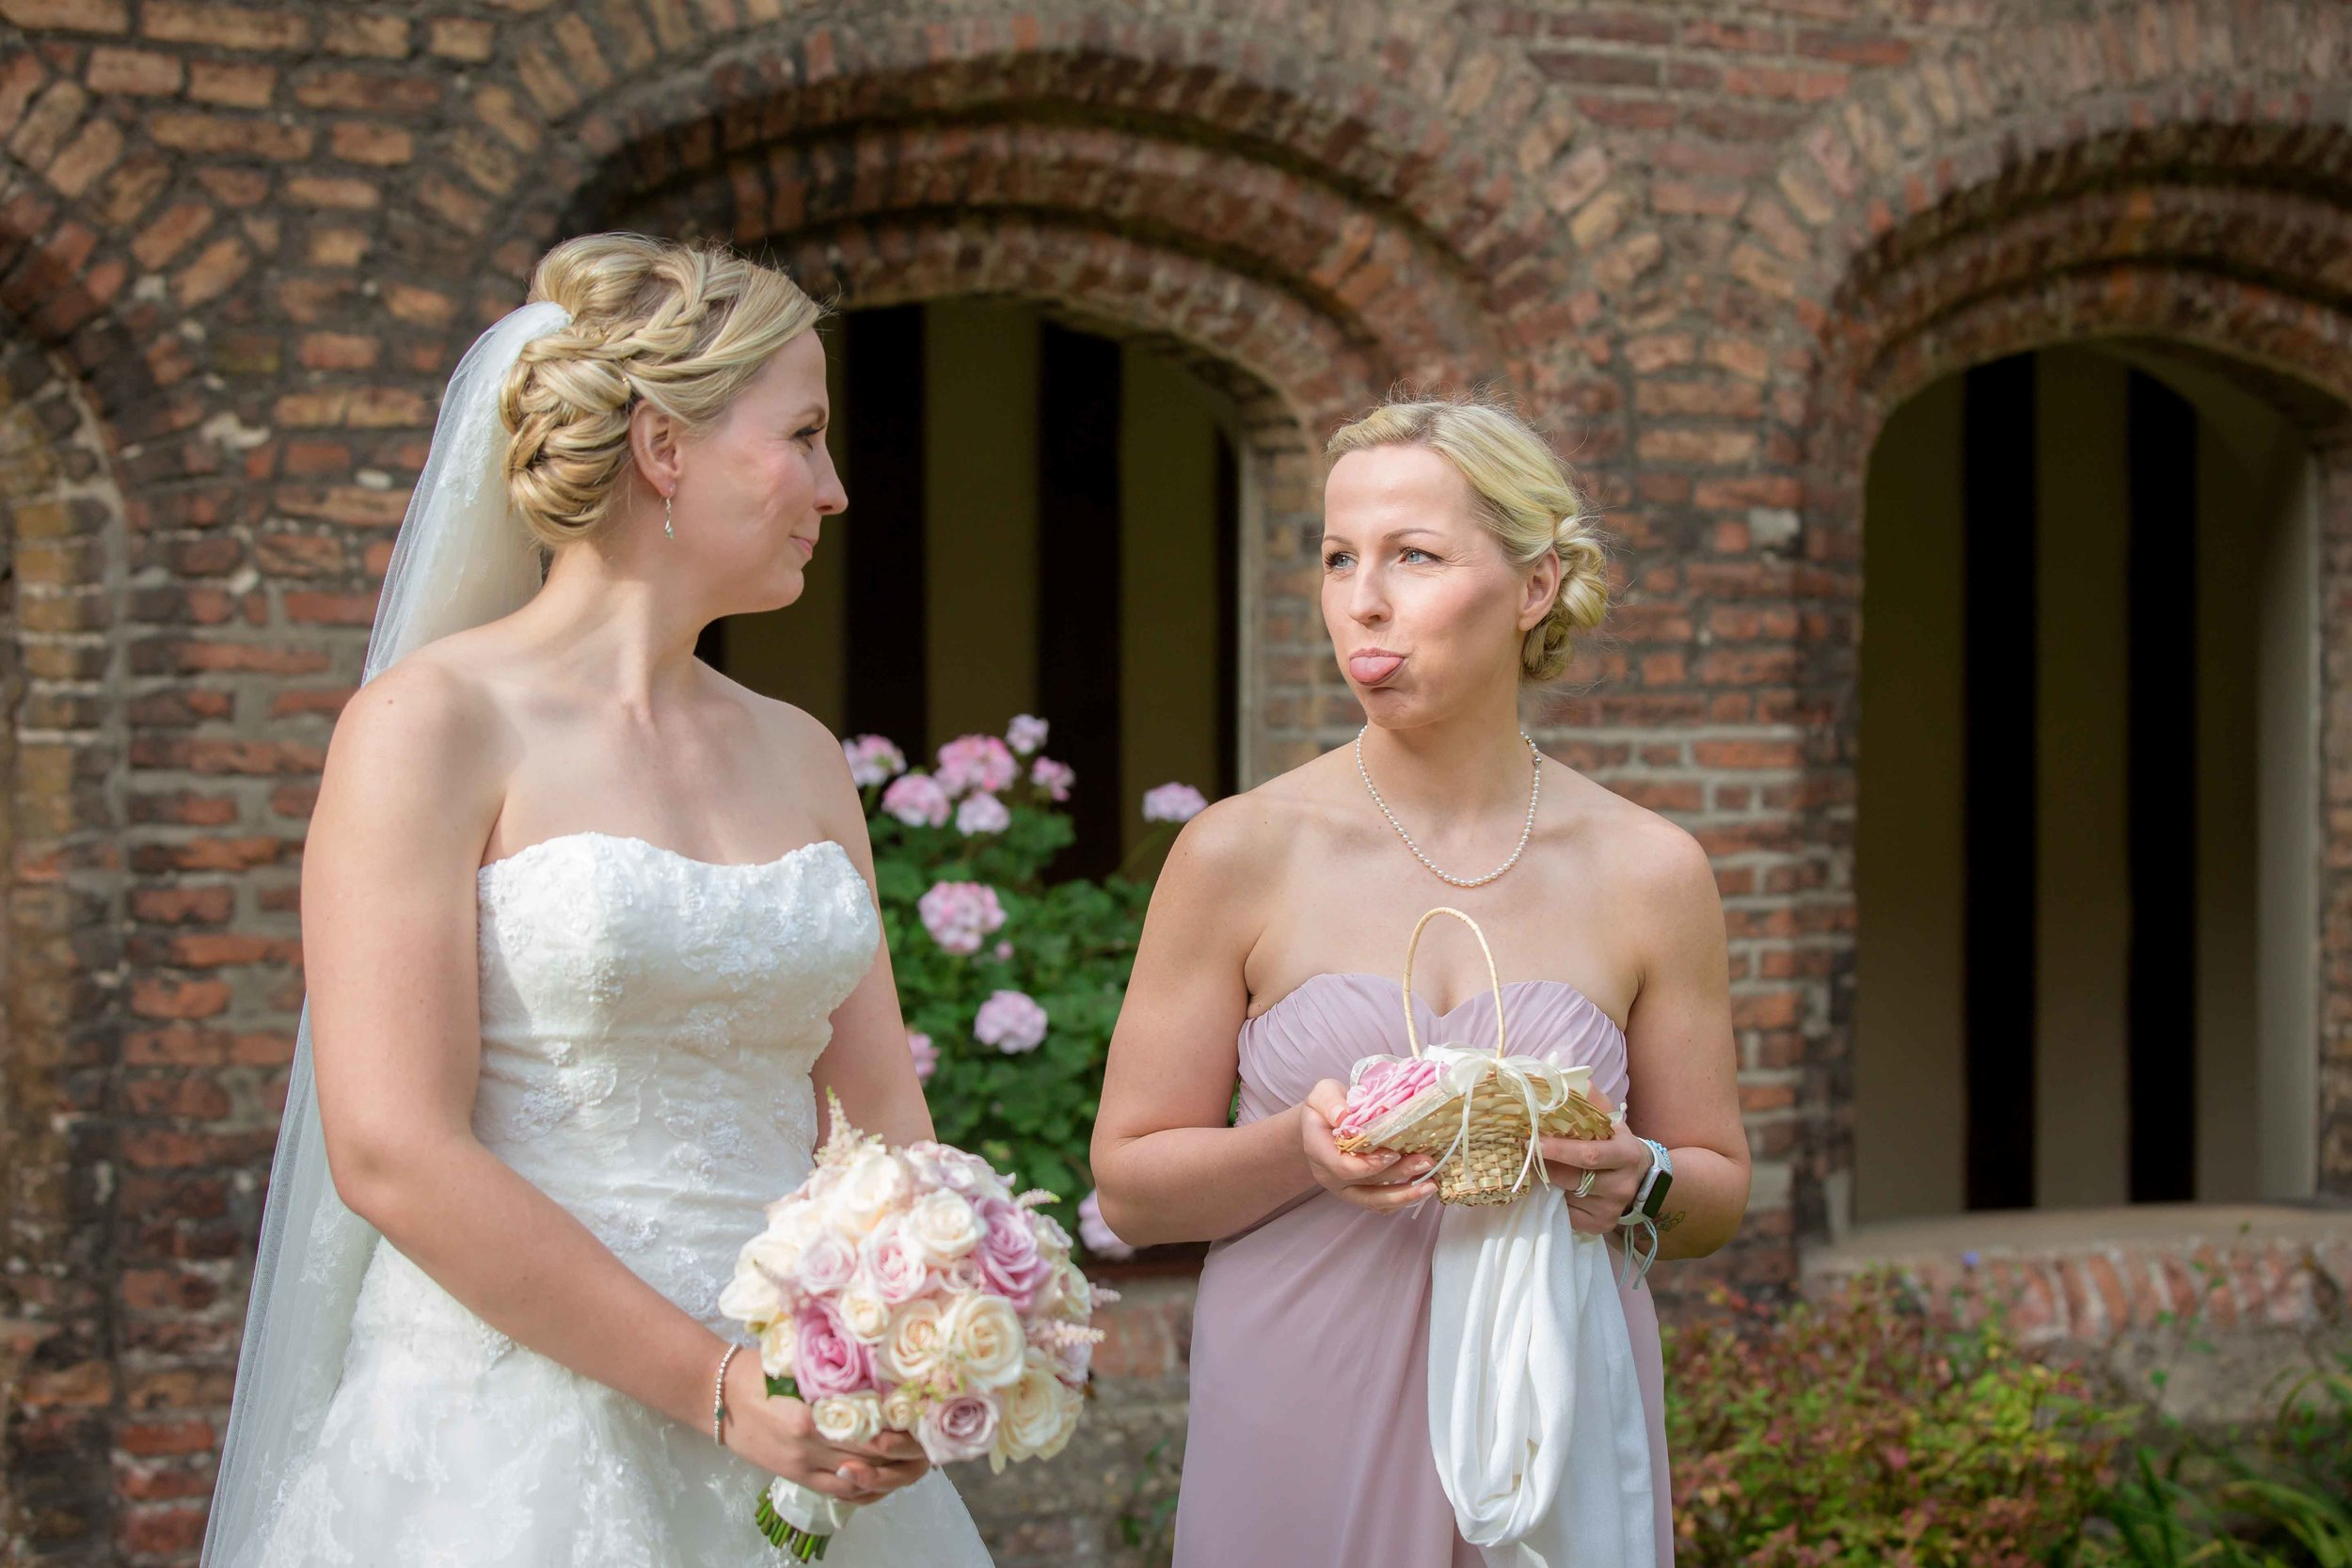 Adrian_Nicole_Charnwood_Weddings_Queens_College_Cambridge-1008.jpg